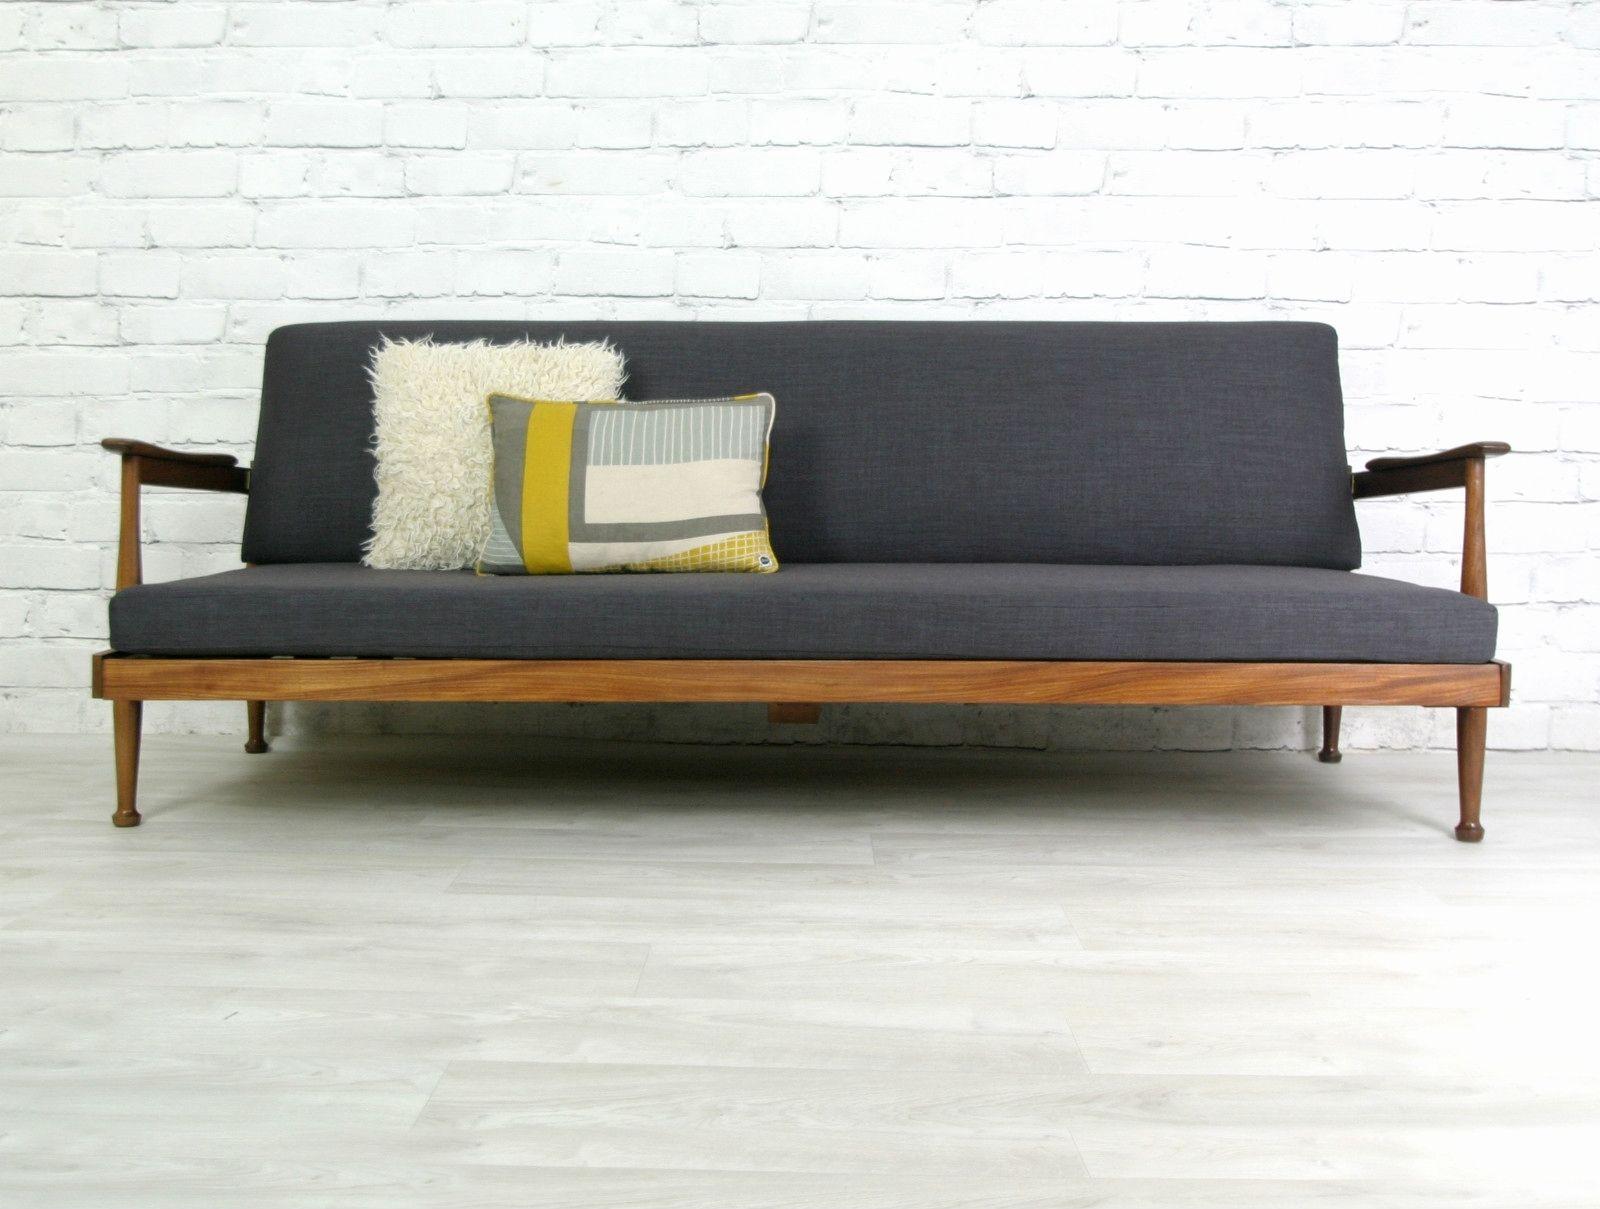 1968 Danish Sleeper Sofa Sofa Design Vintage Mid Century Furniture Danish Style Sofas